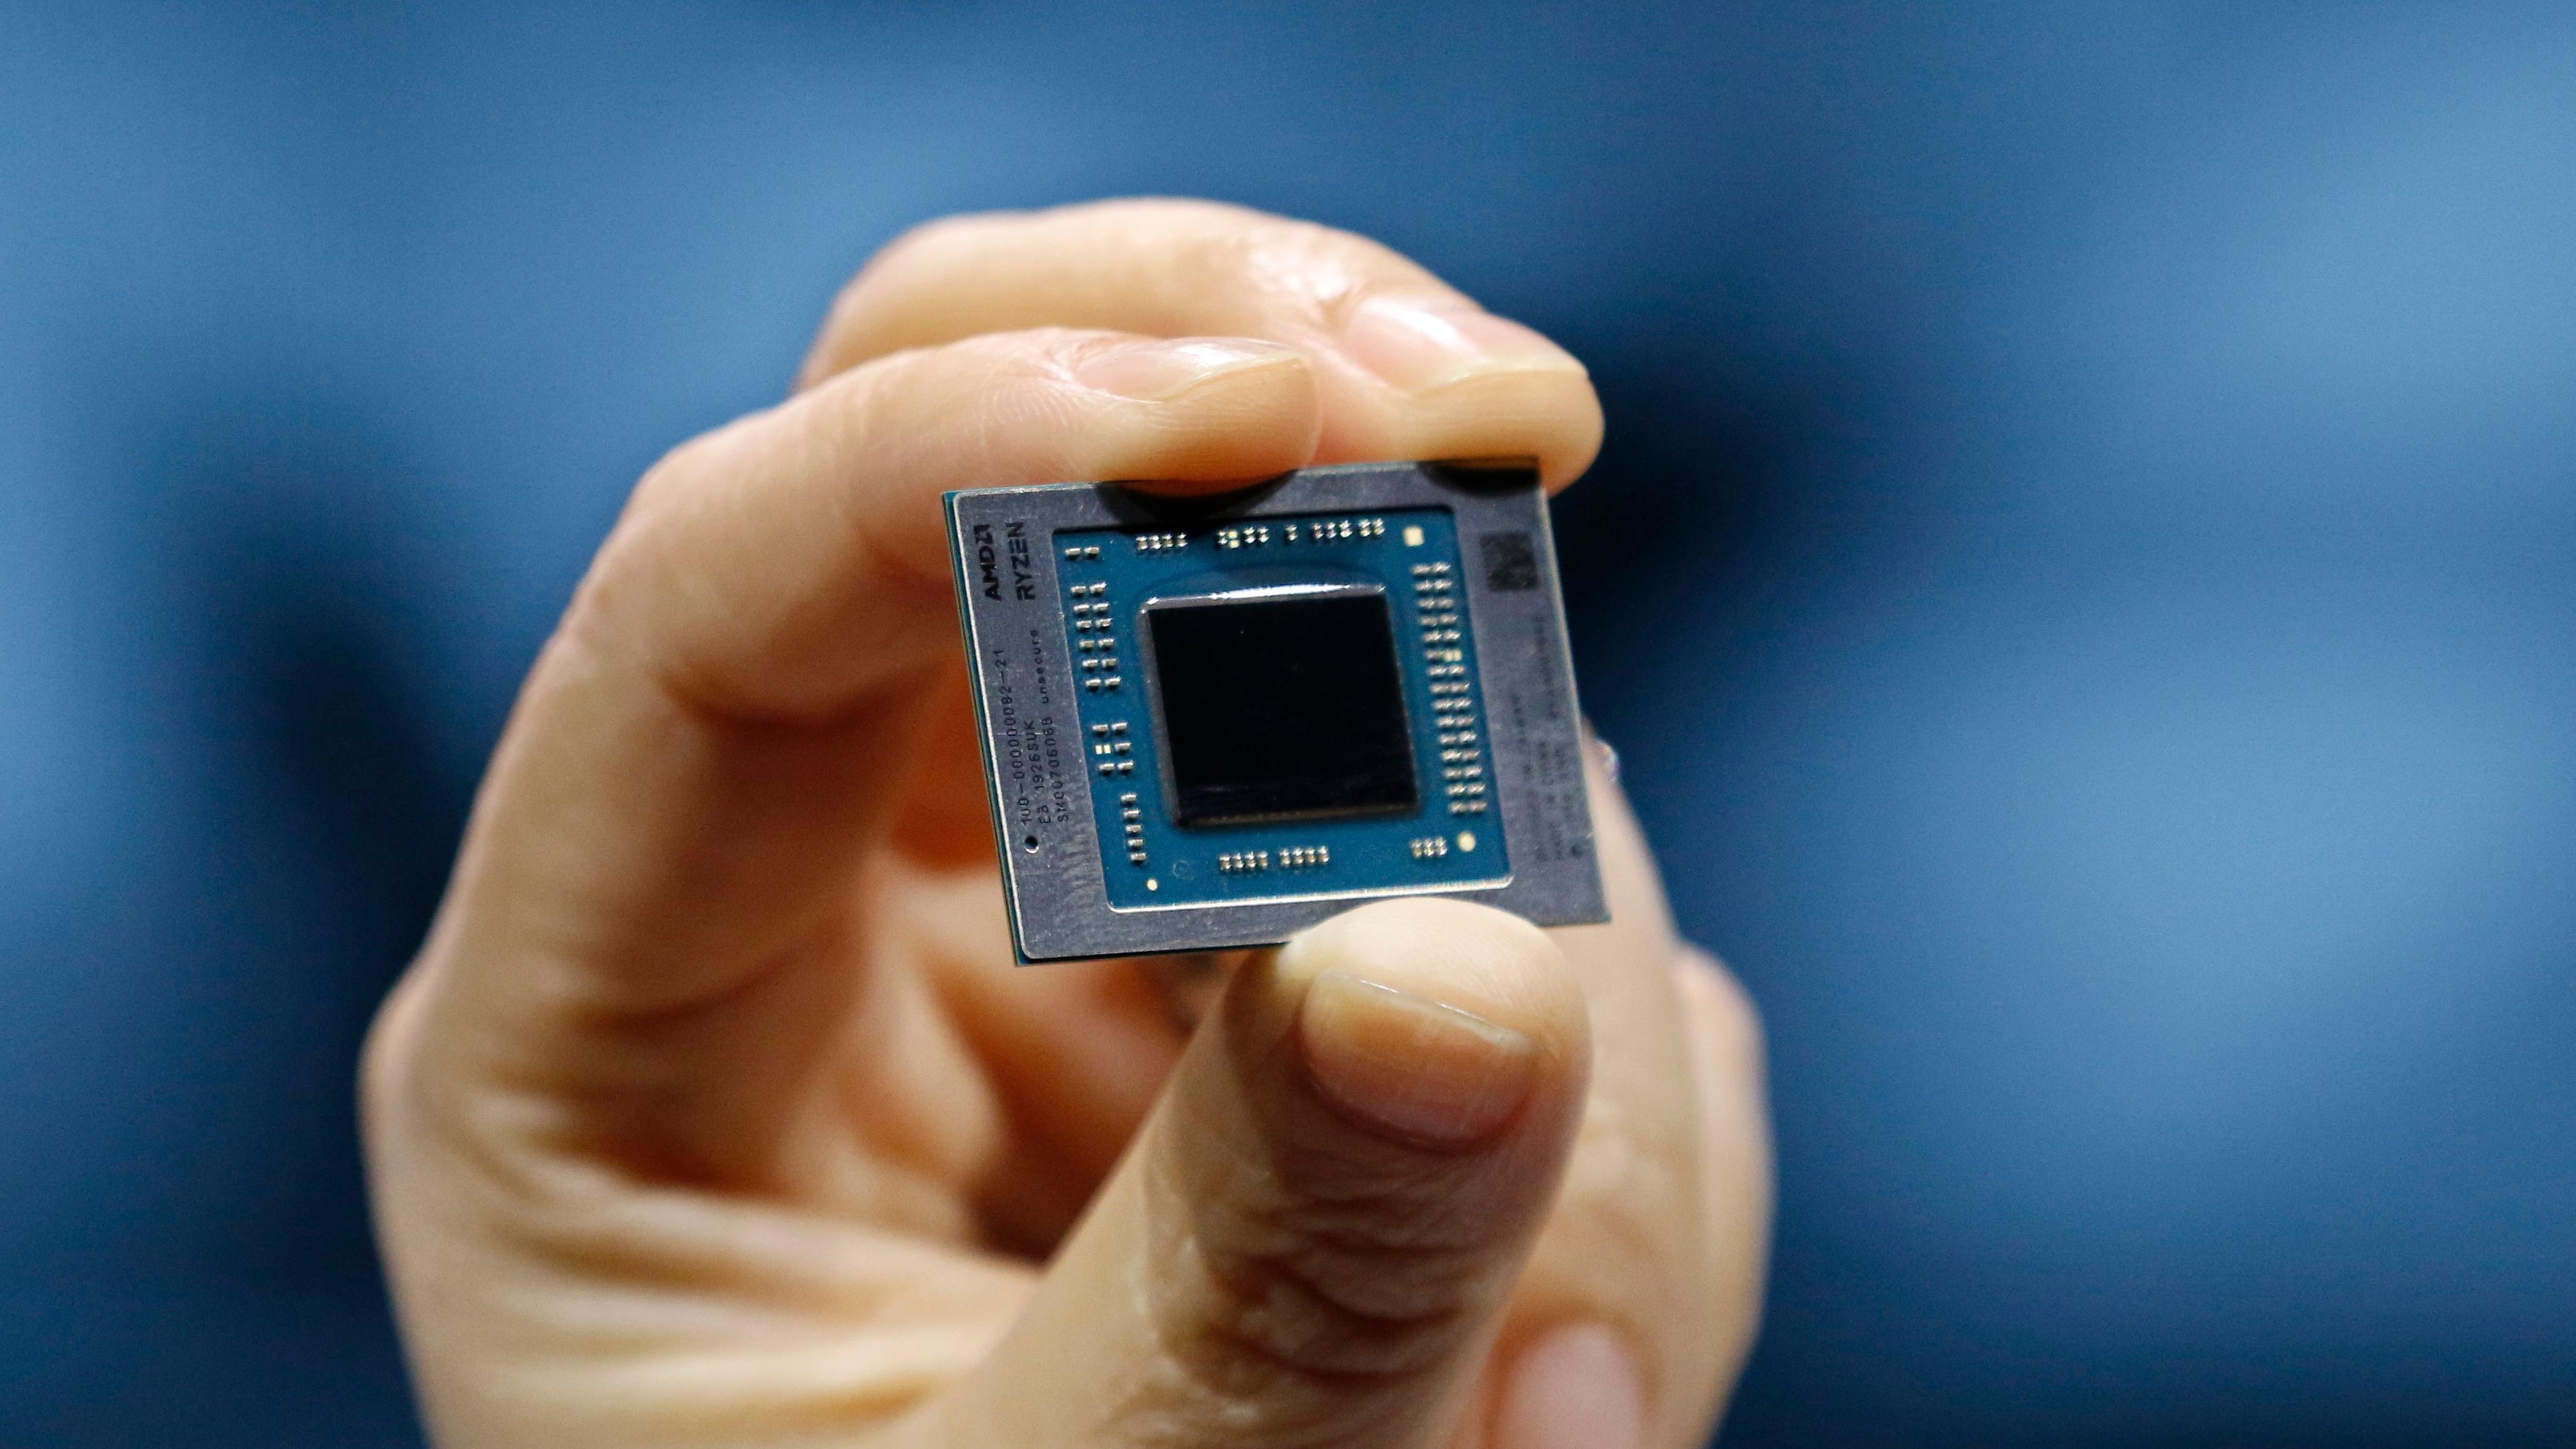 AMD Ryzen 7 4700G разогнан до 4,75 ГГц по всем 8 ядрам со стандартным охлаждением